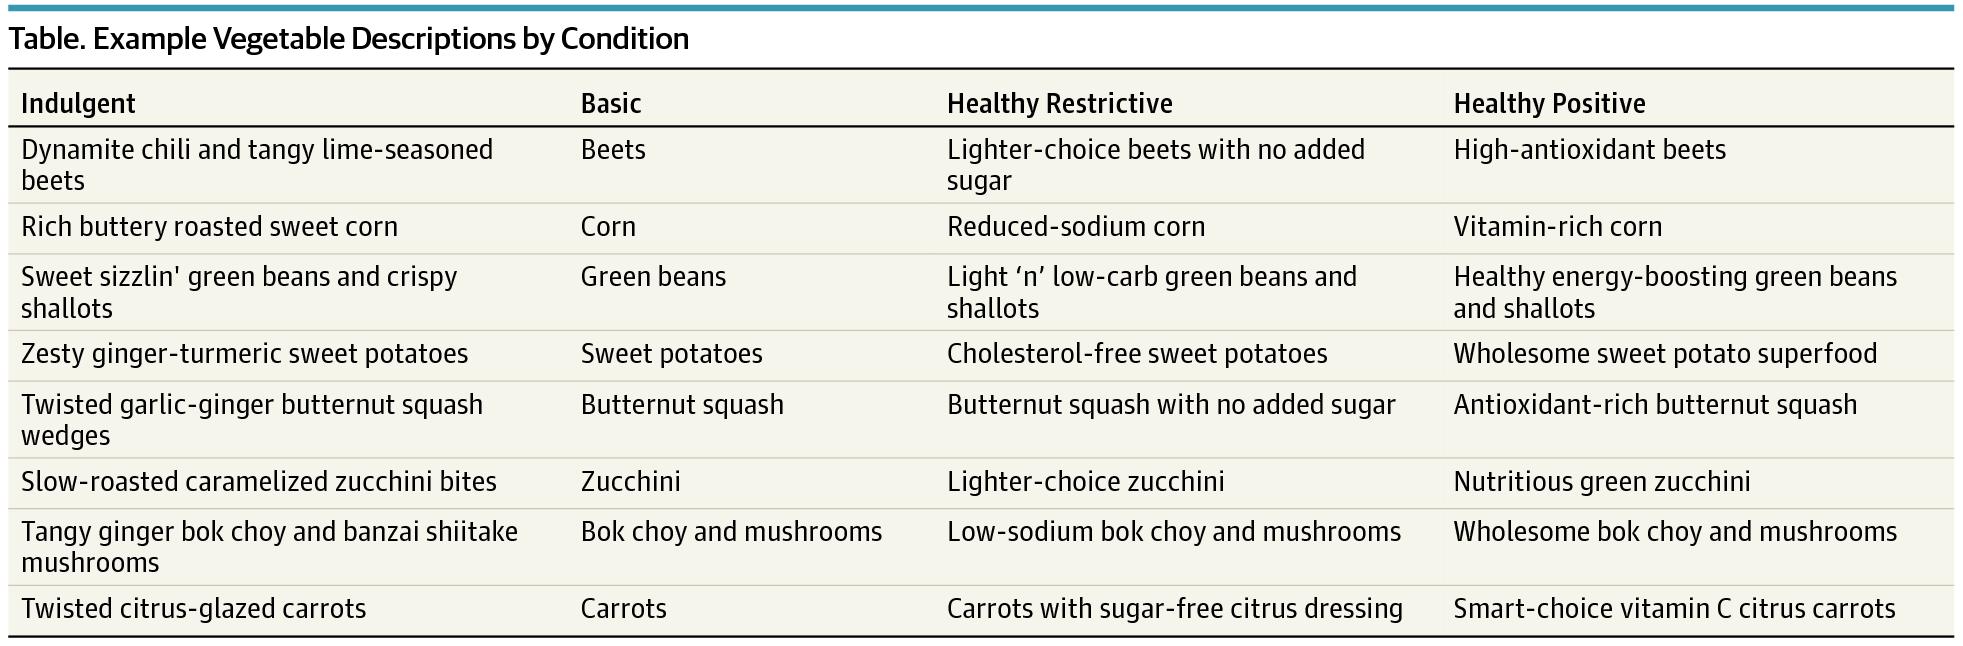 JAMA Veggies Descriptions